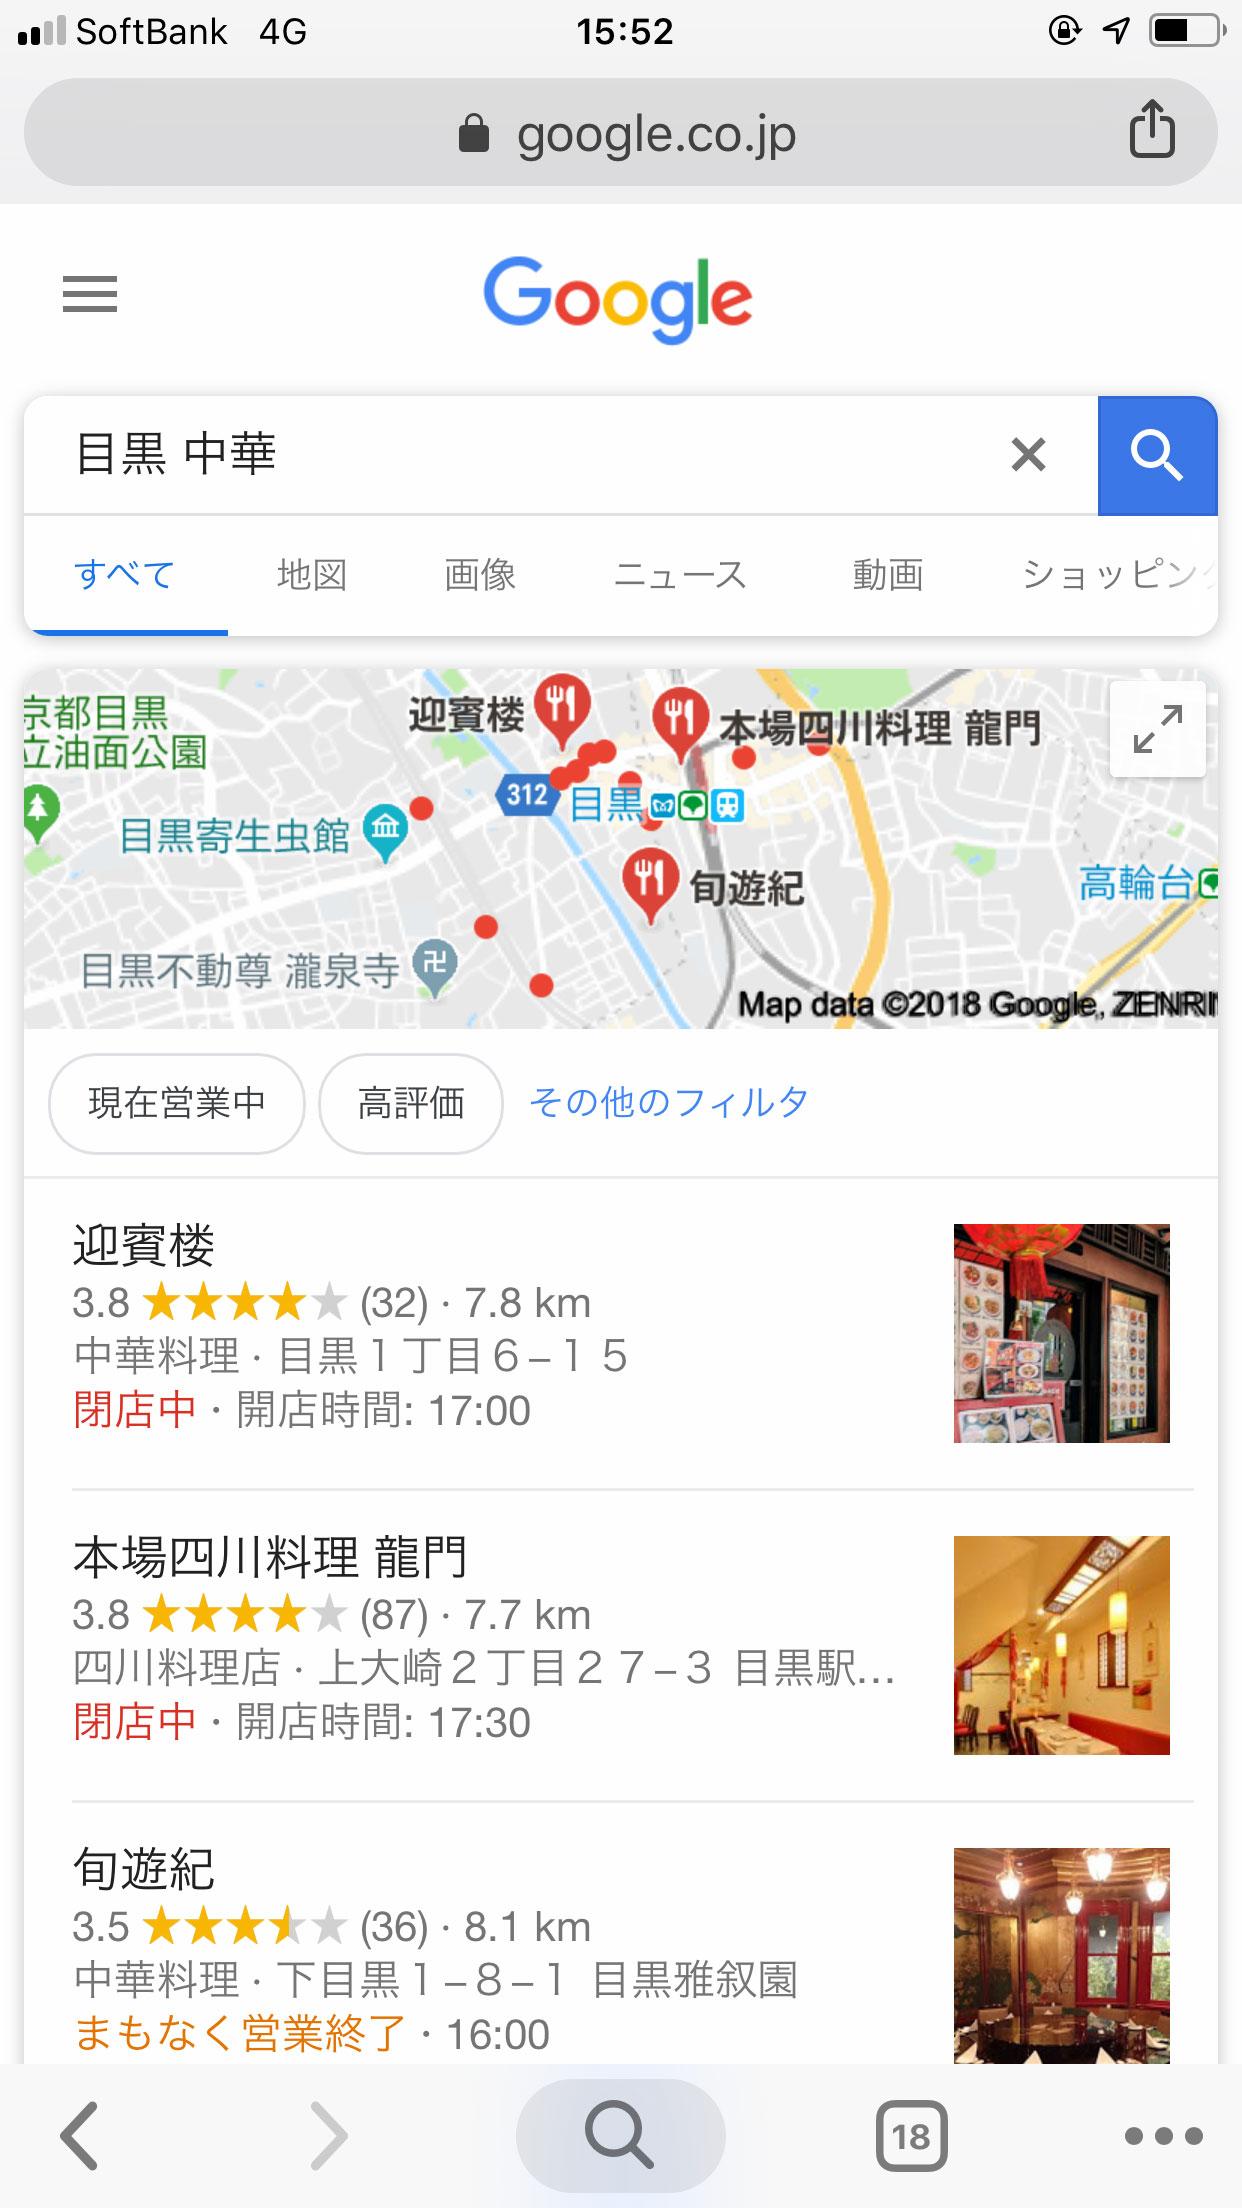 Google検索結果画面(モバイル)